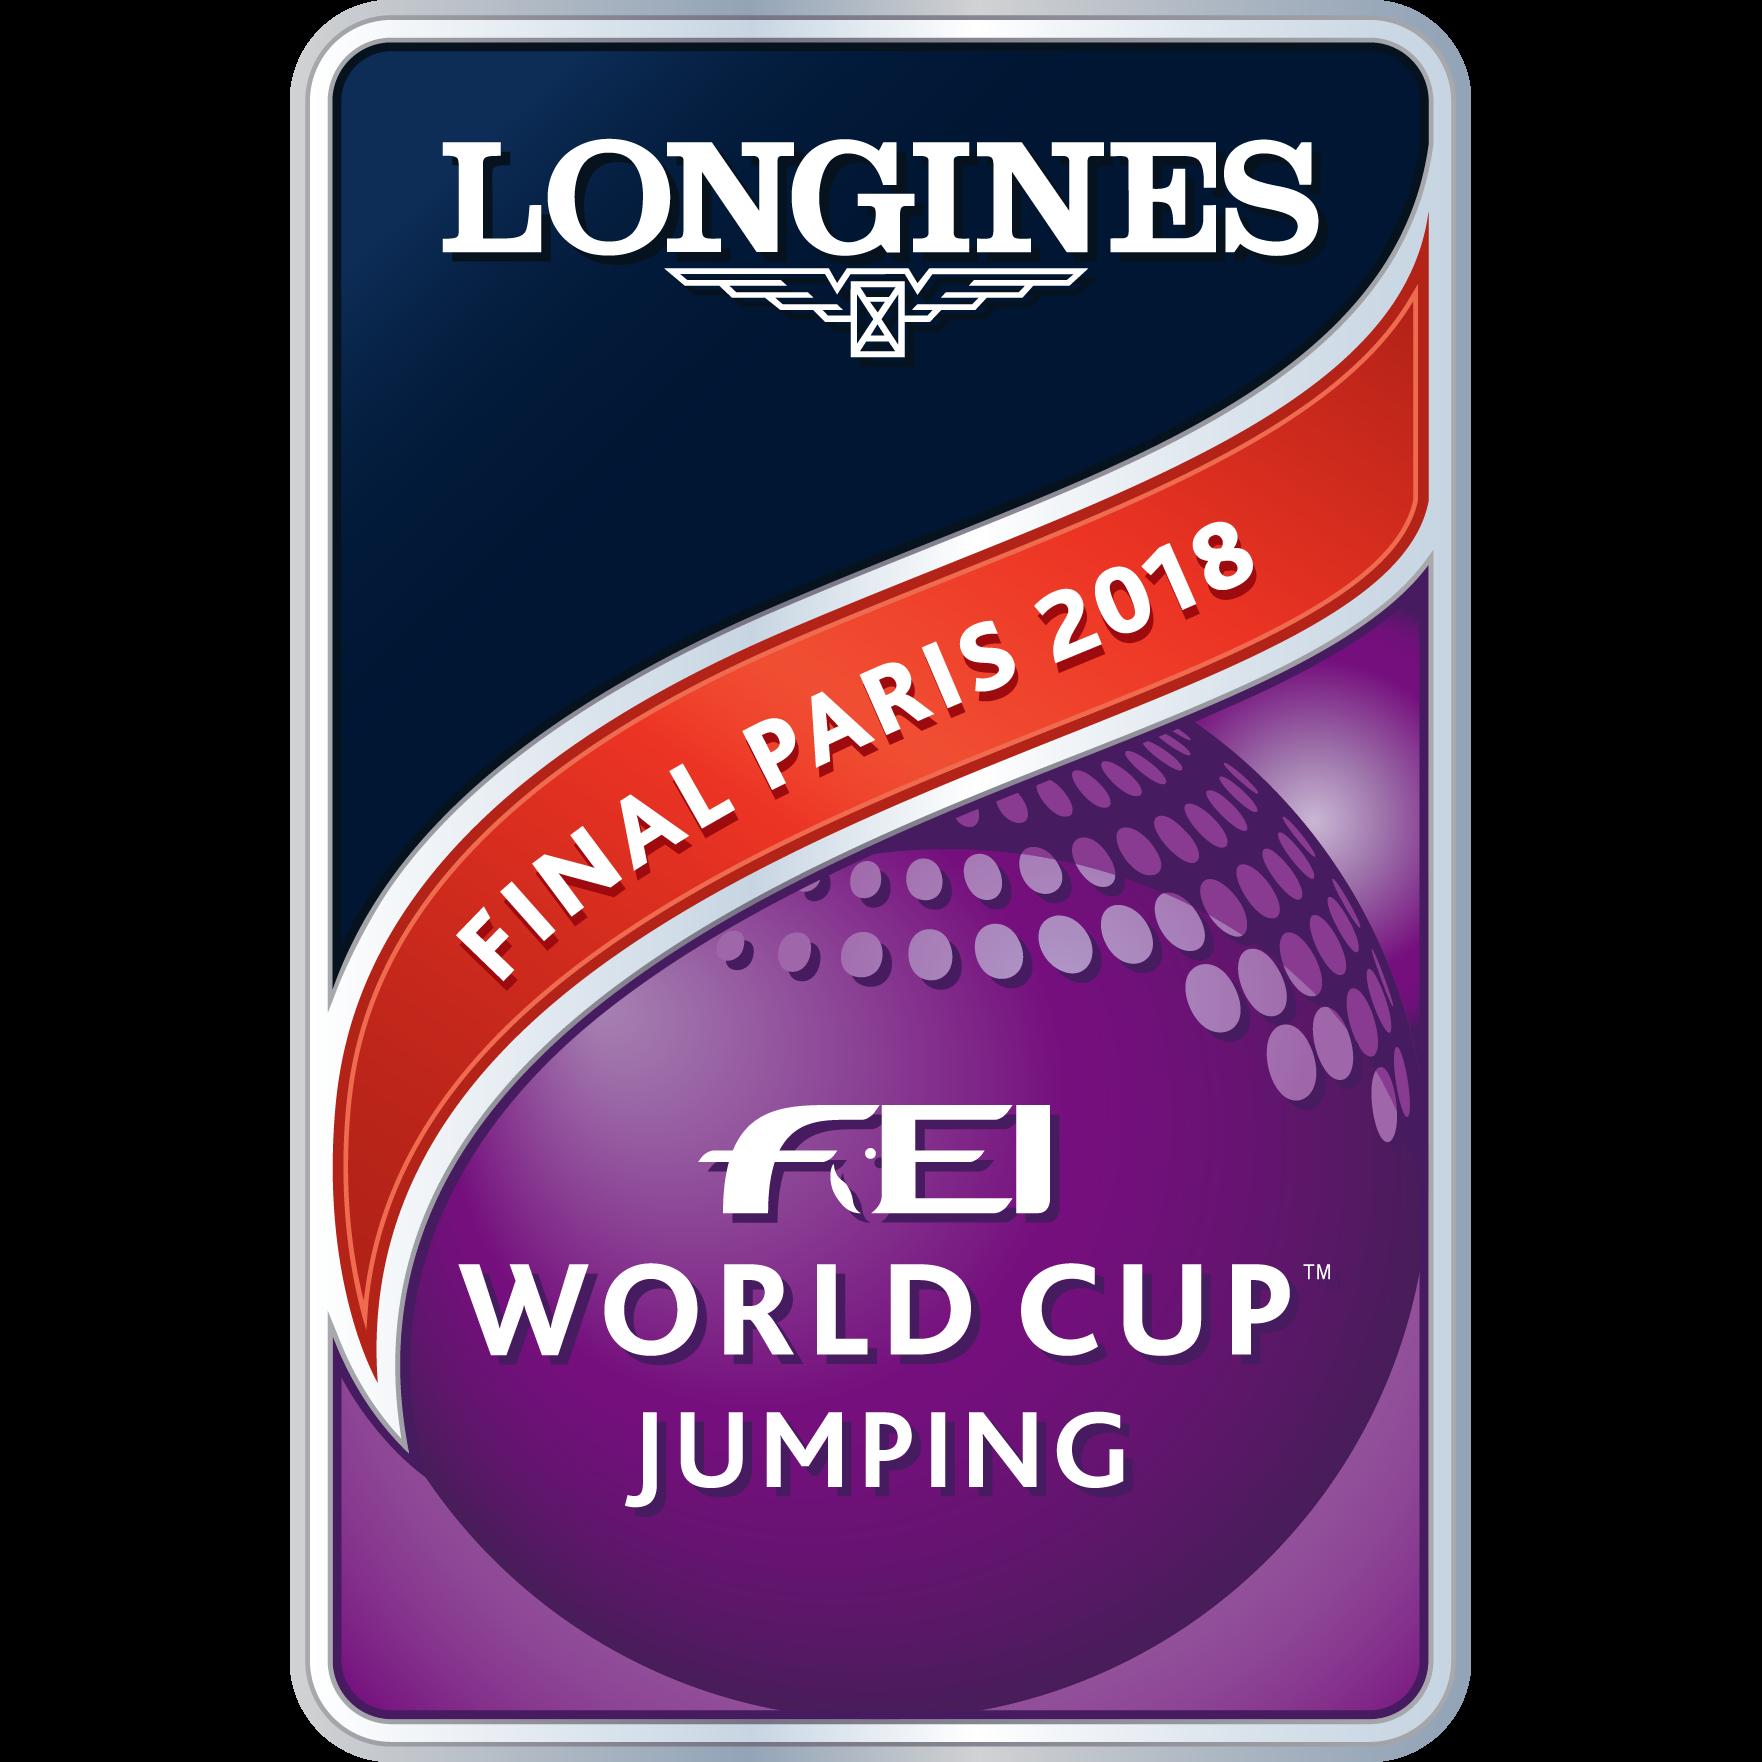 2018 Equestrian World Cup - Final